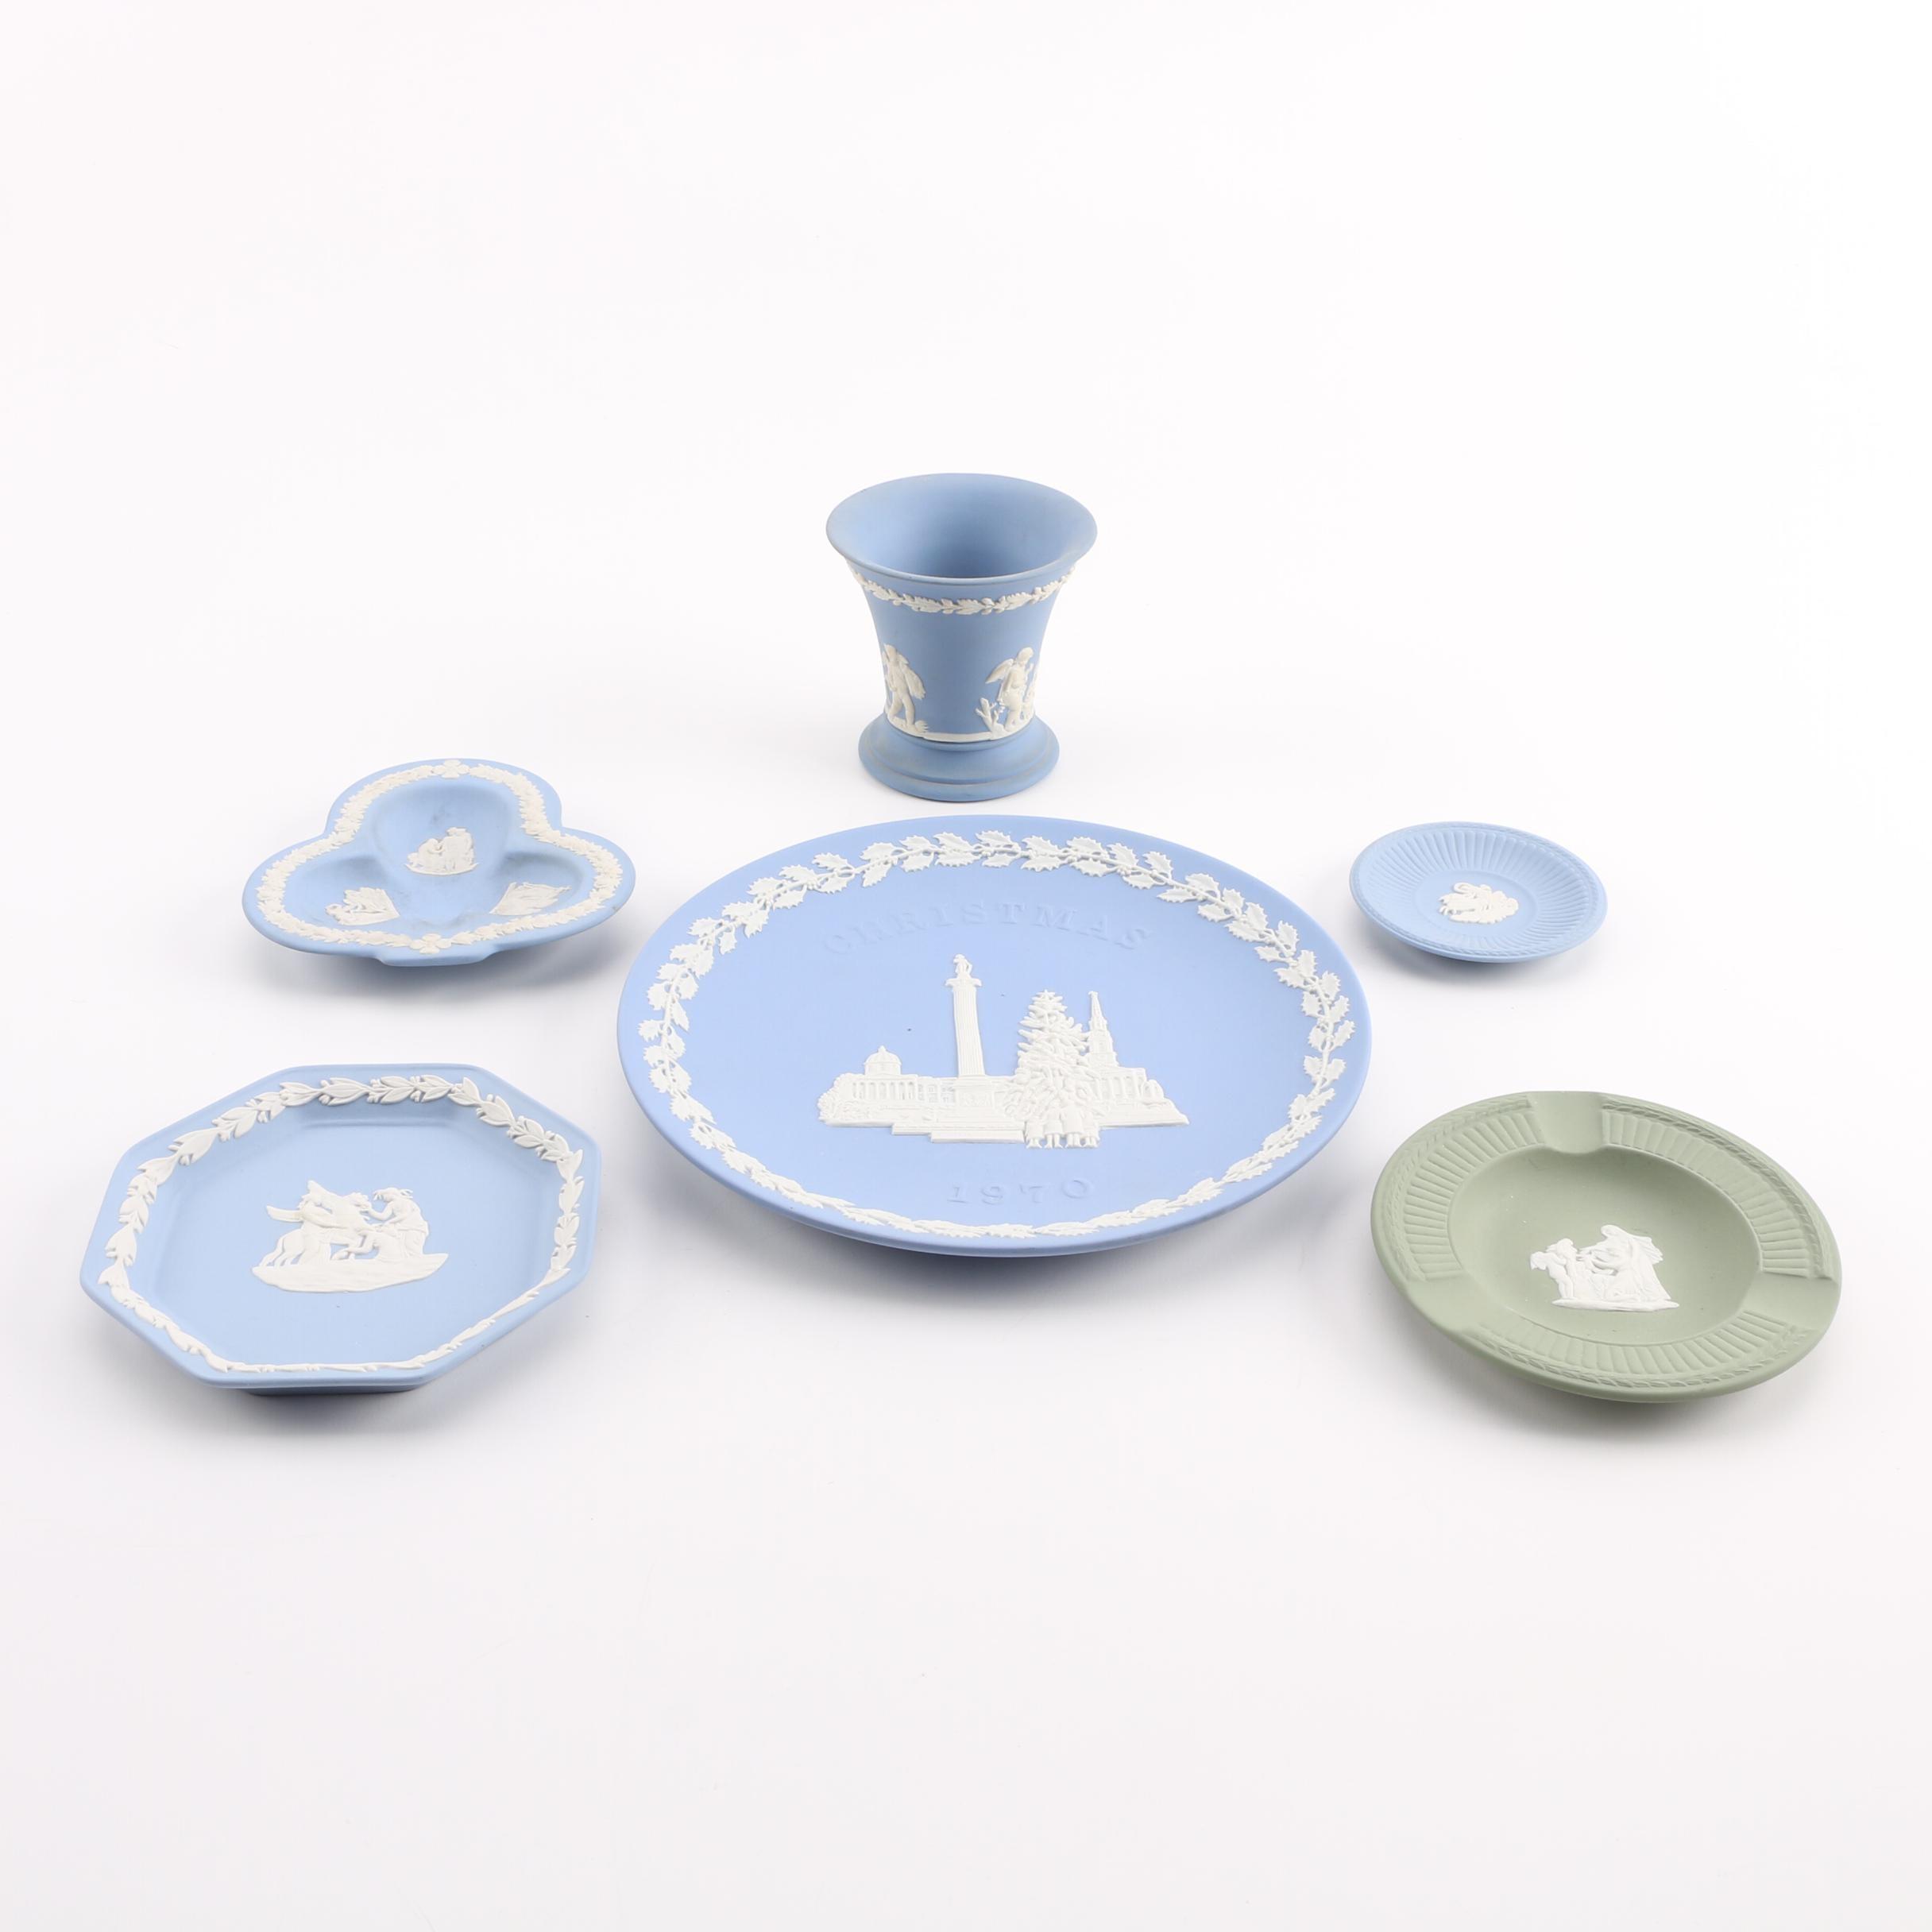 Wedgwood Cream on Pale Blue and Celadon Jasperware